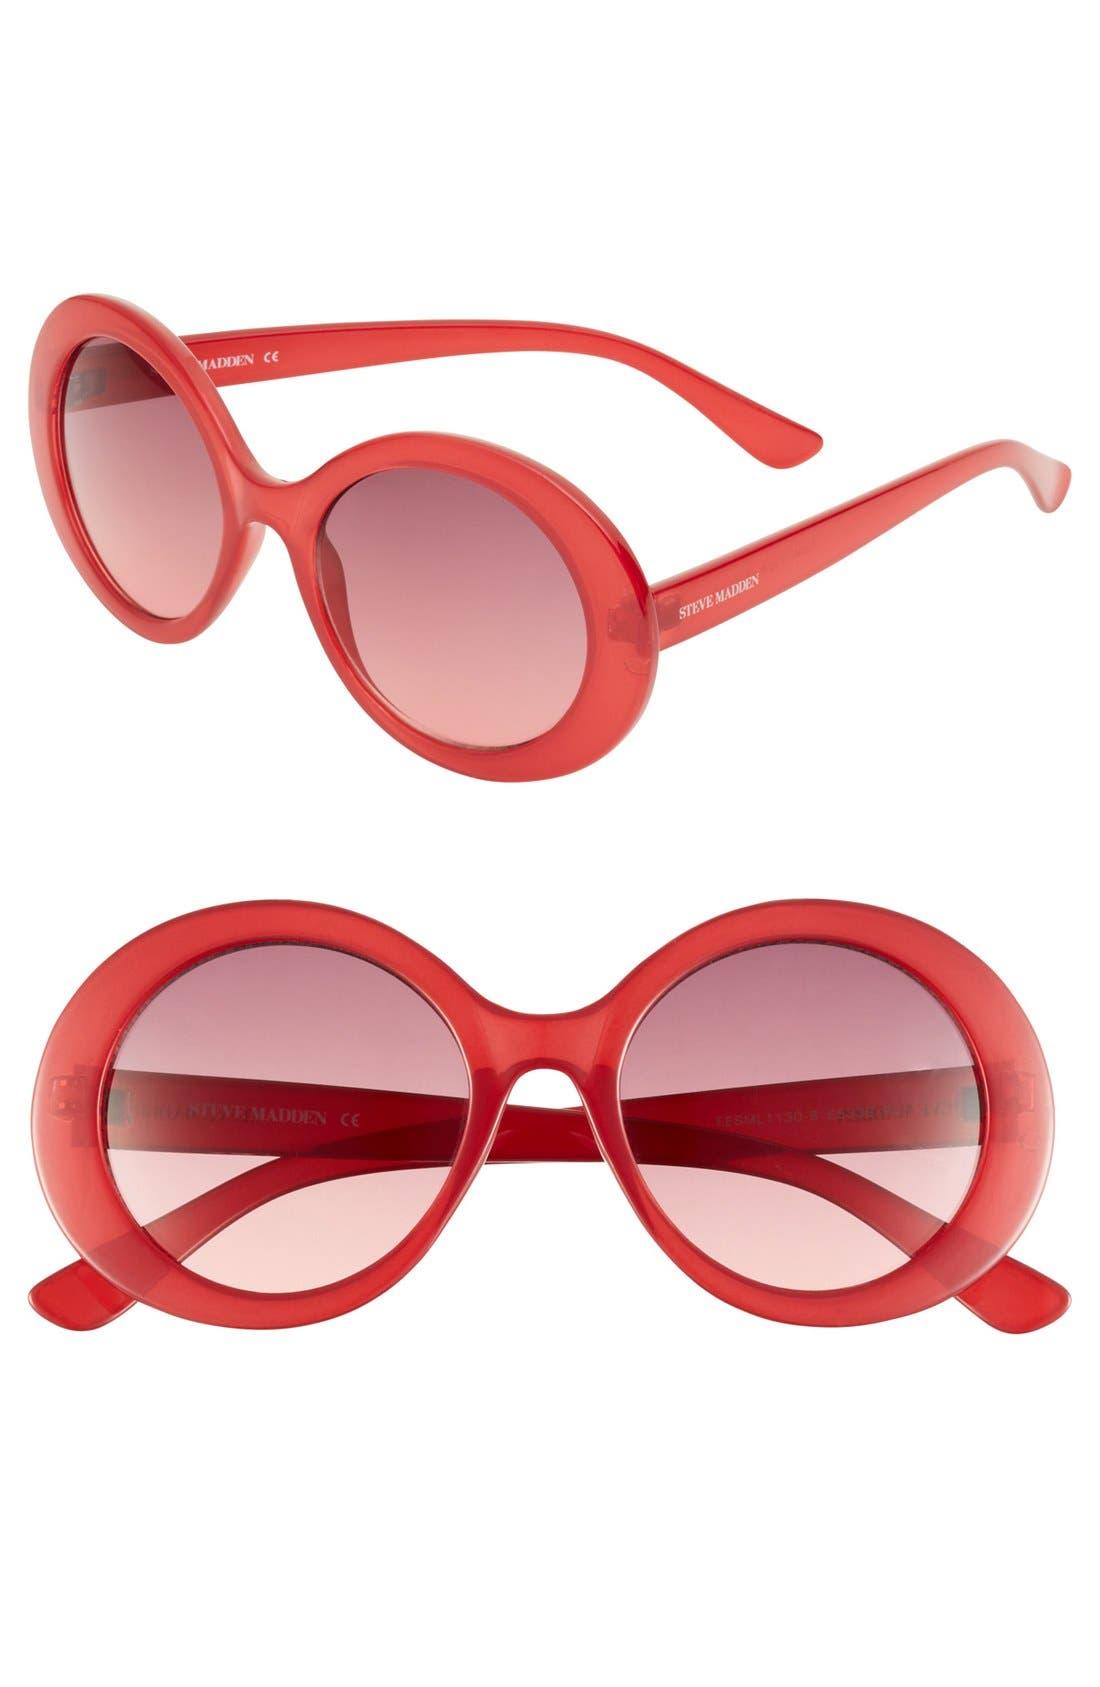 Main Image - Steve Madden Round Sunglasses